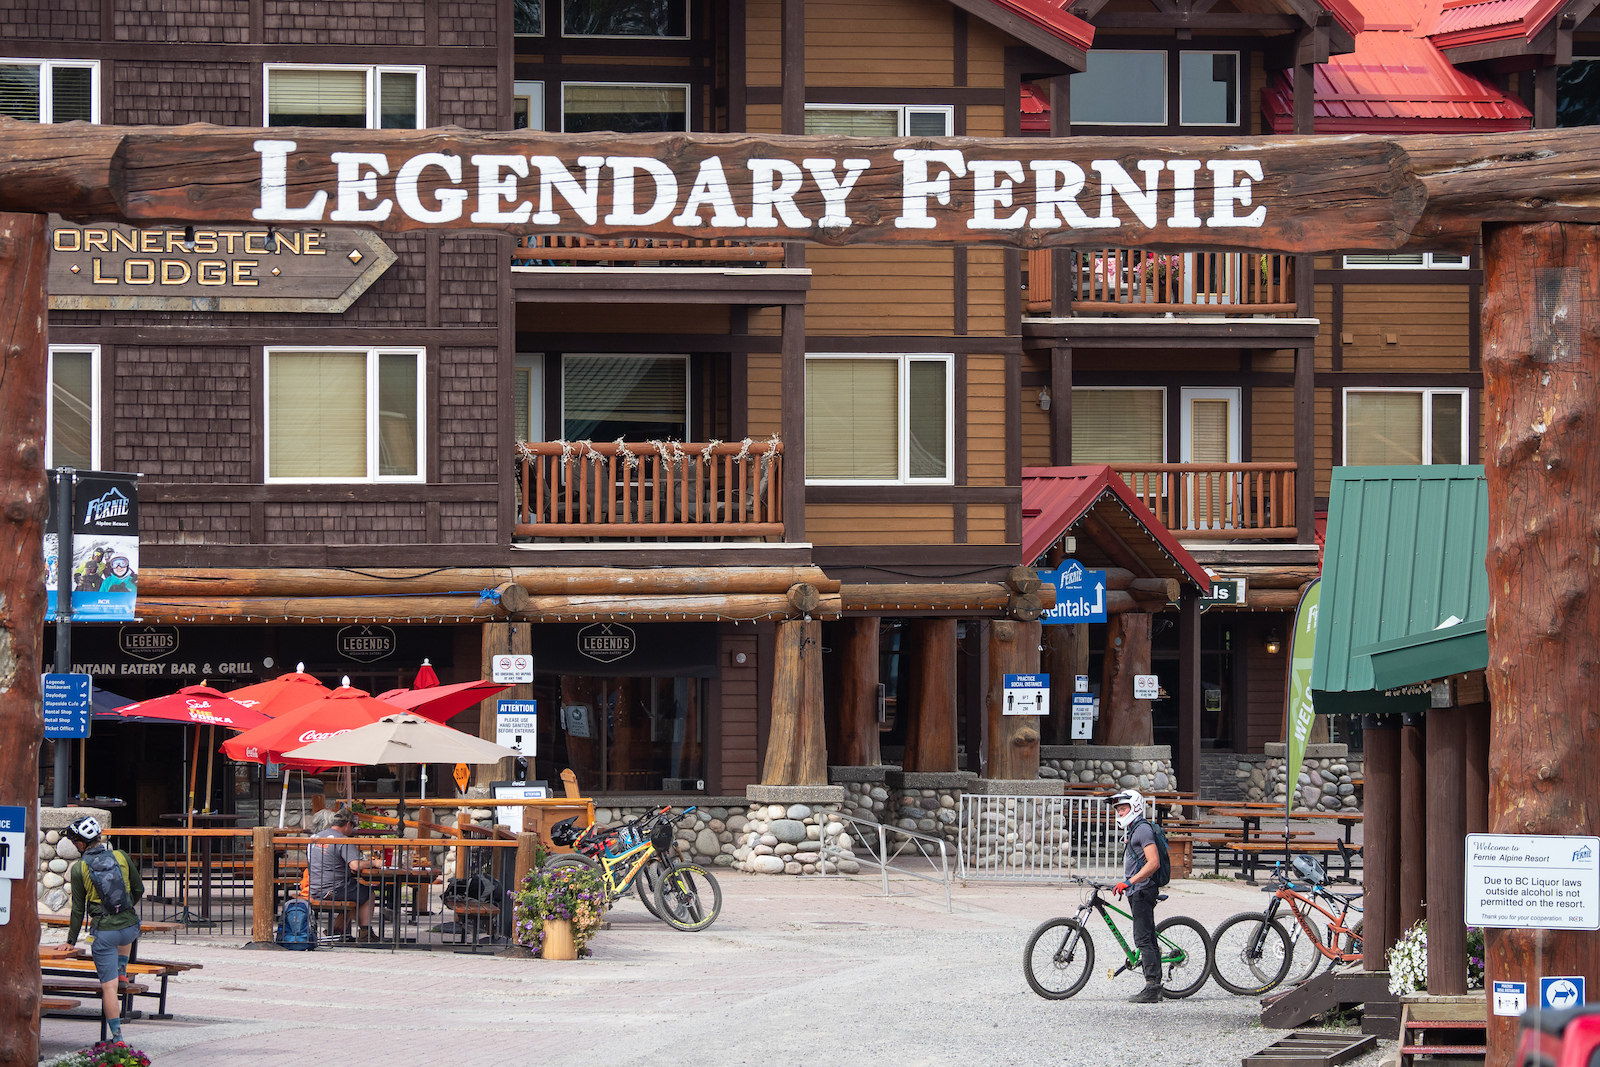 Legendary Fernie is right